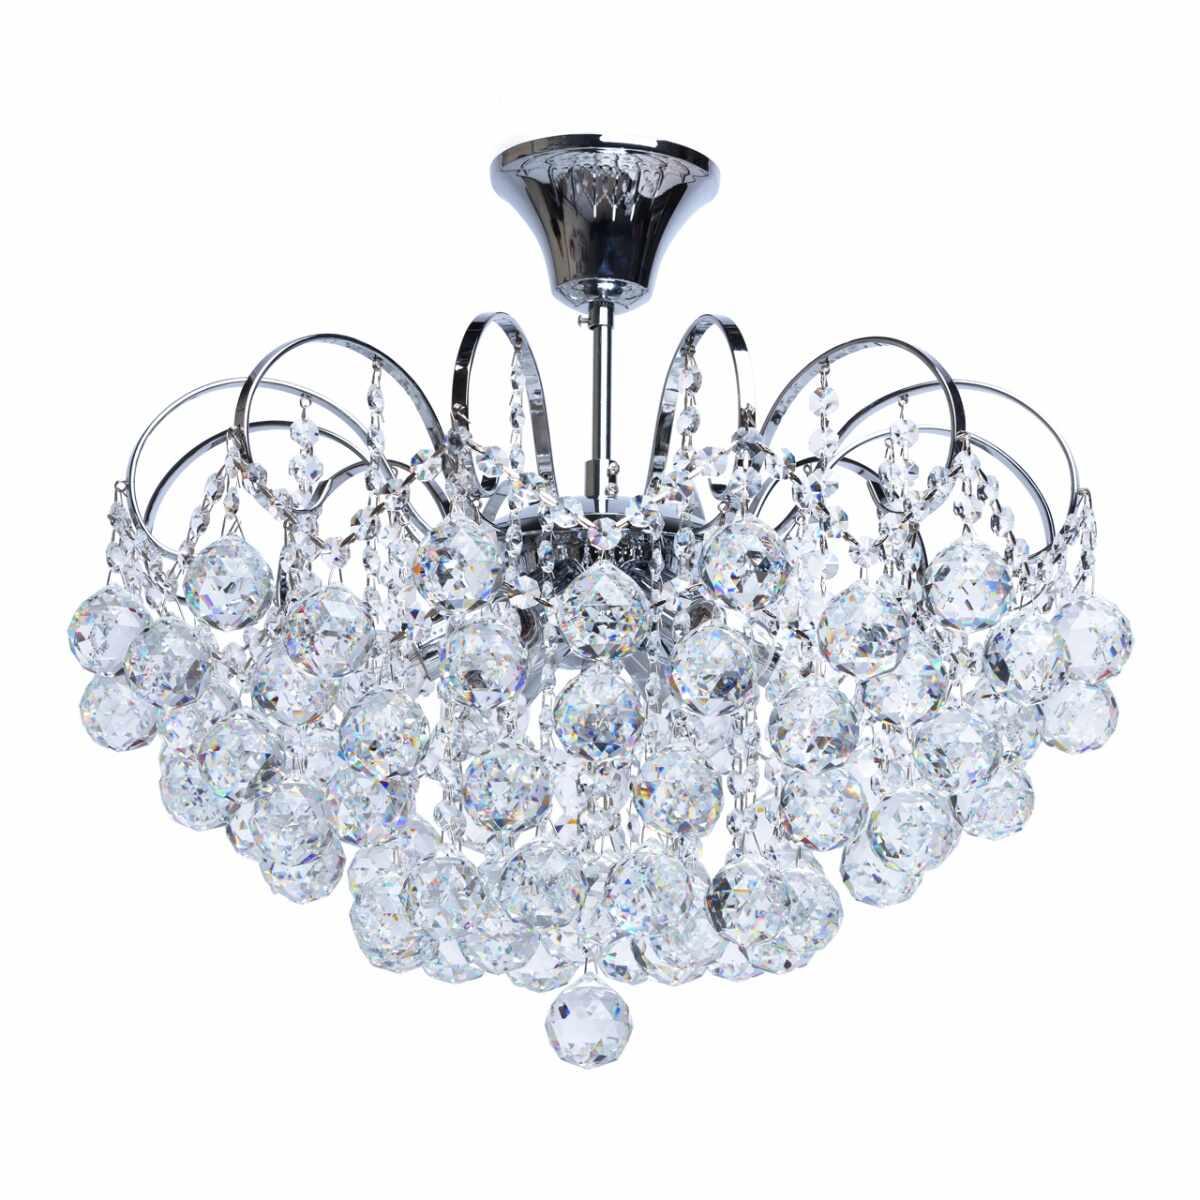 Plafoniera MW-Light Crystal 232017506 la pret 1450 lei